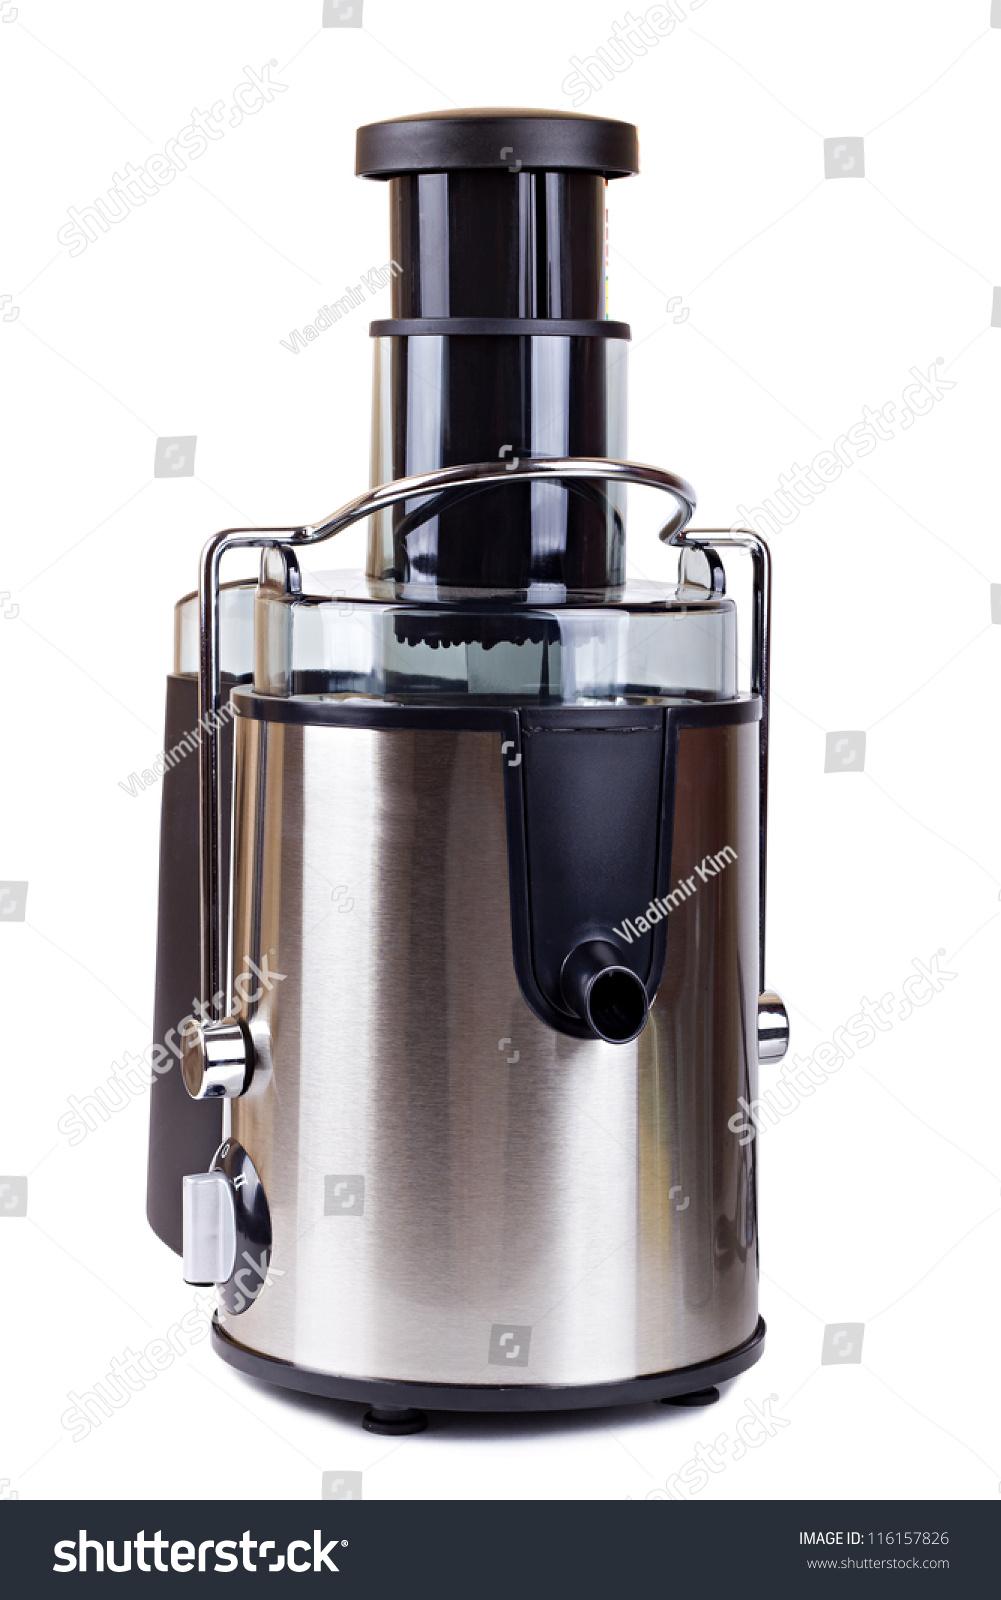 Electric Juice Extractor ~ Electric juice extractor isolated on white stock photo